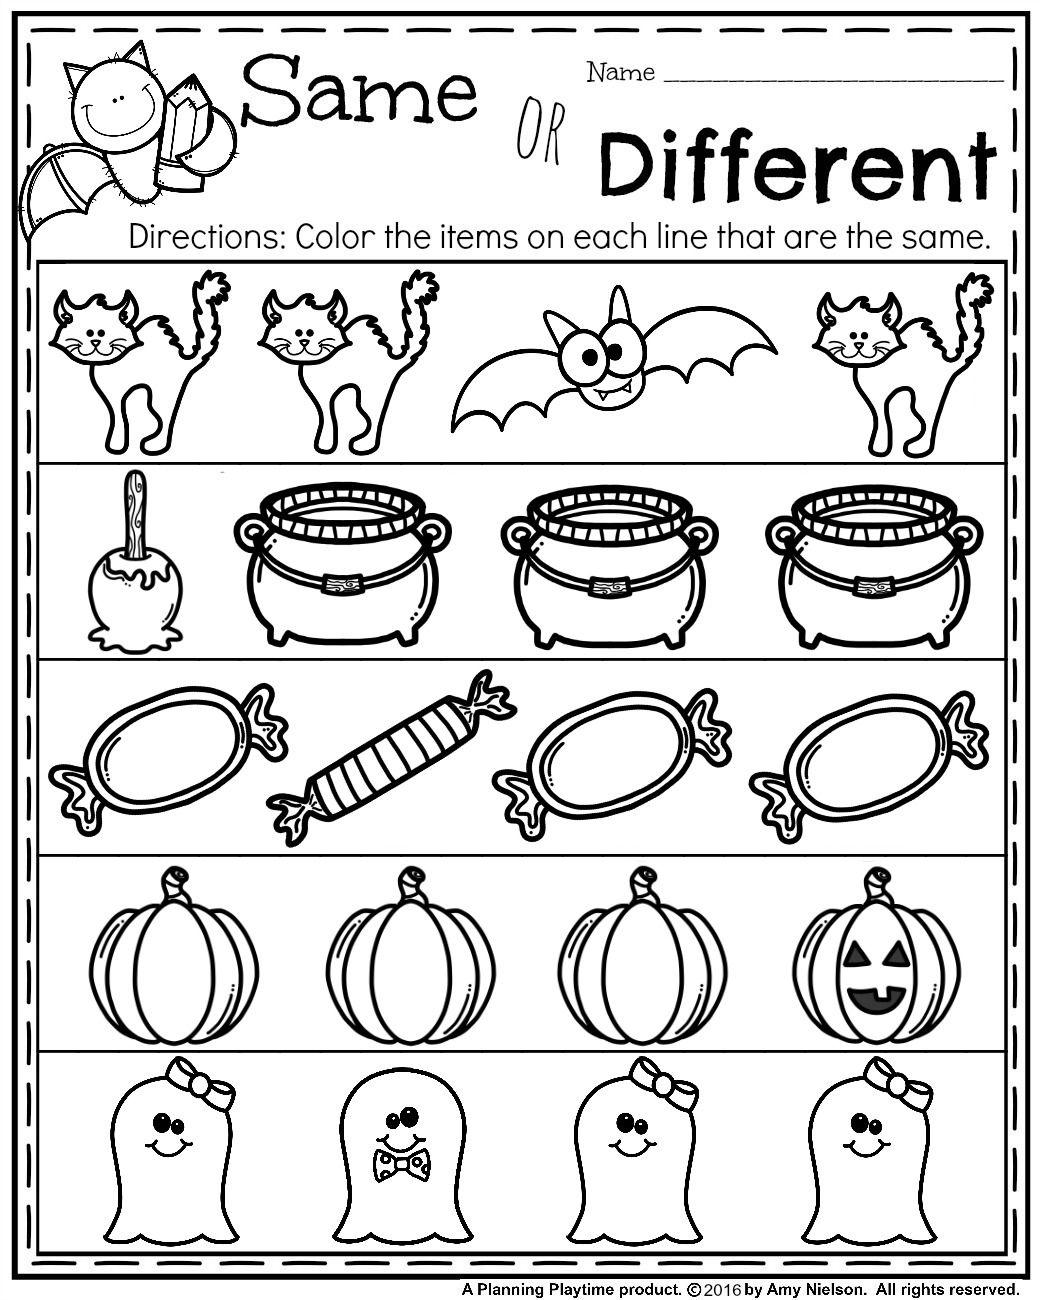 October Preschool Worksheets | Preschool worksheets ...